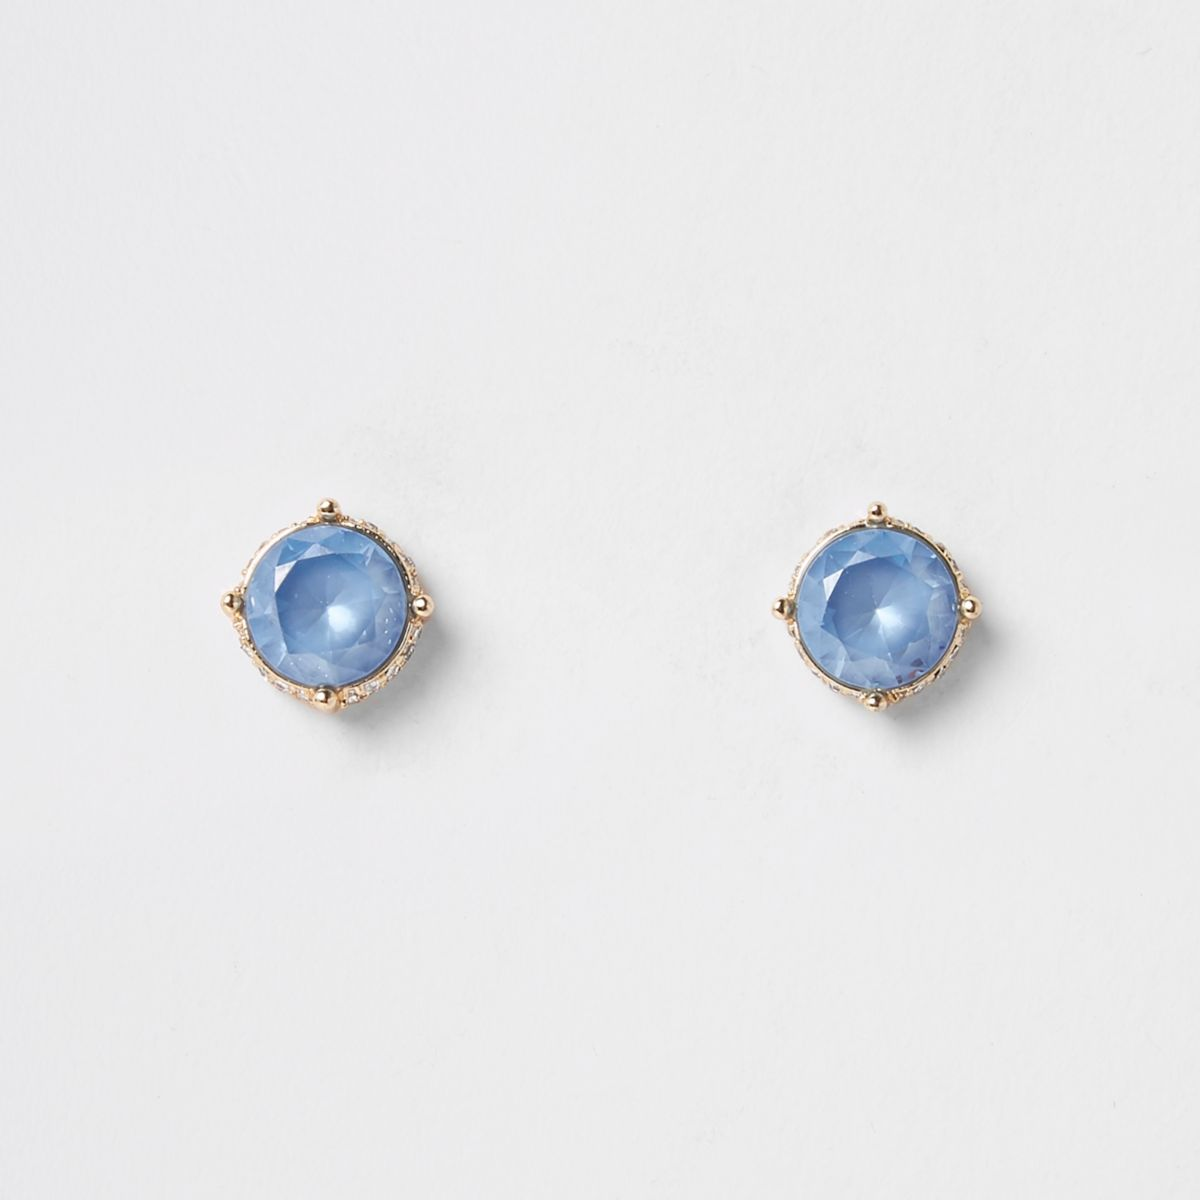 Light blue gold tone diamante pave earrings